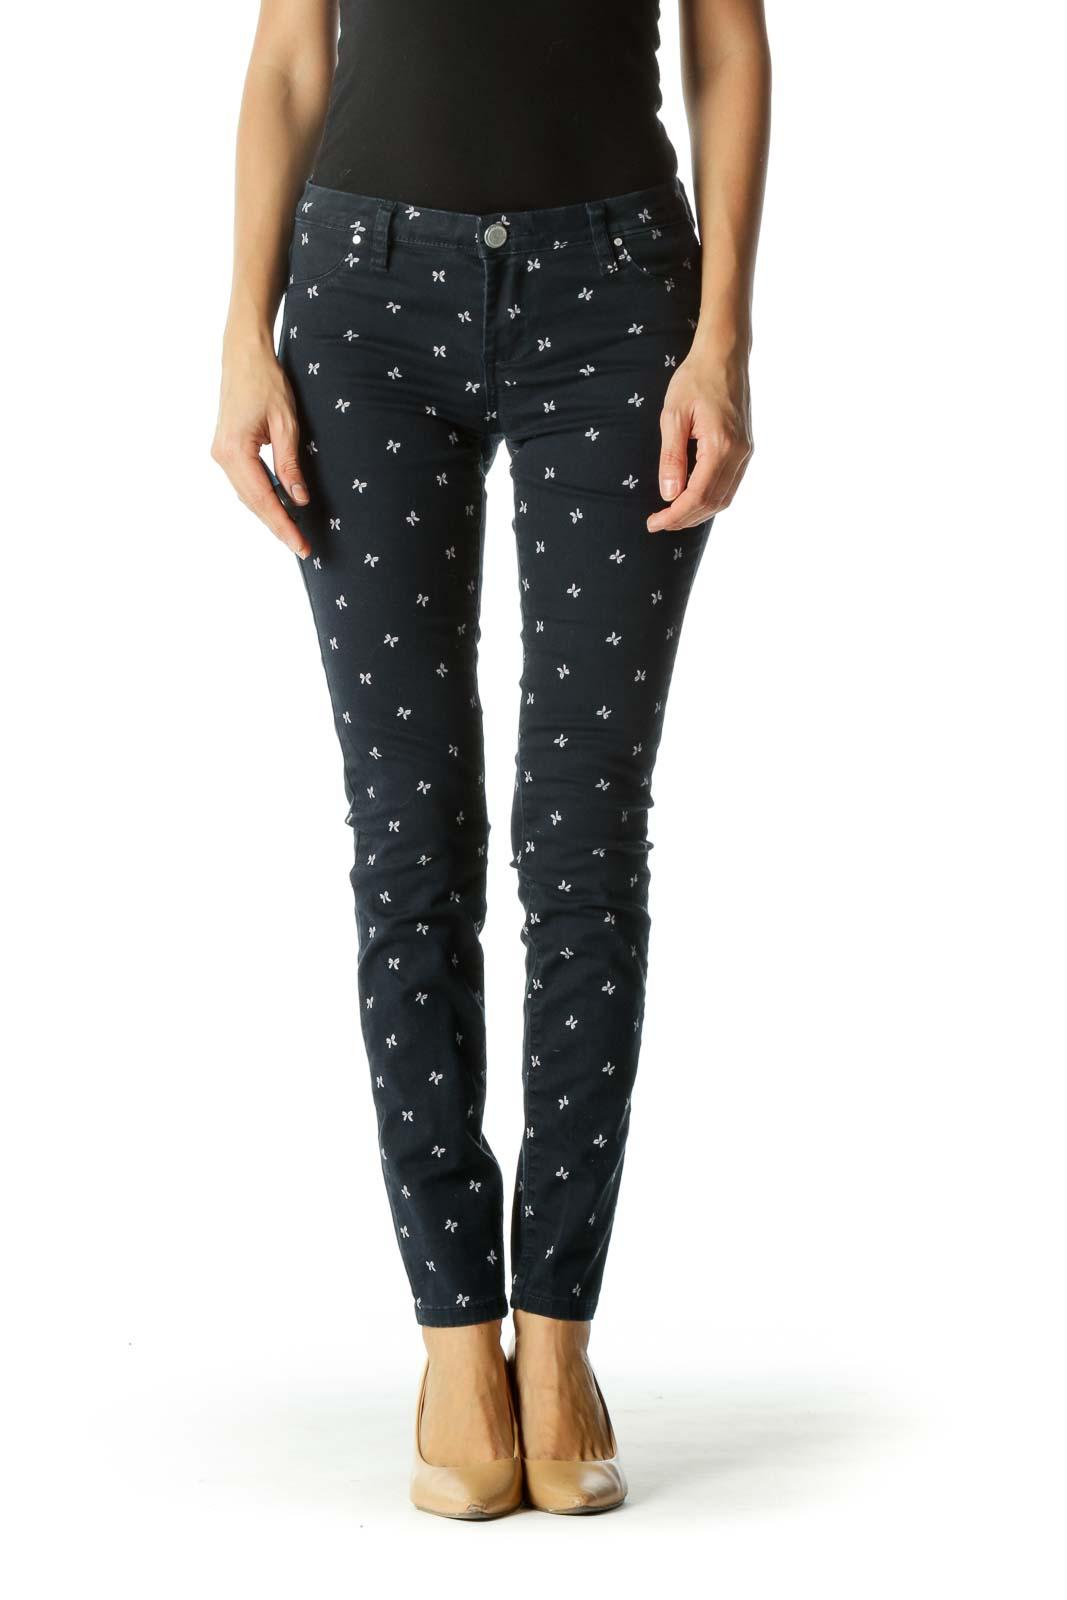 Blue Bow Patterned Slim-Fit Pants Front